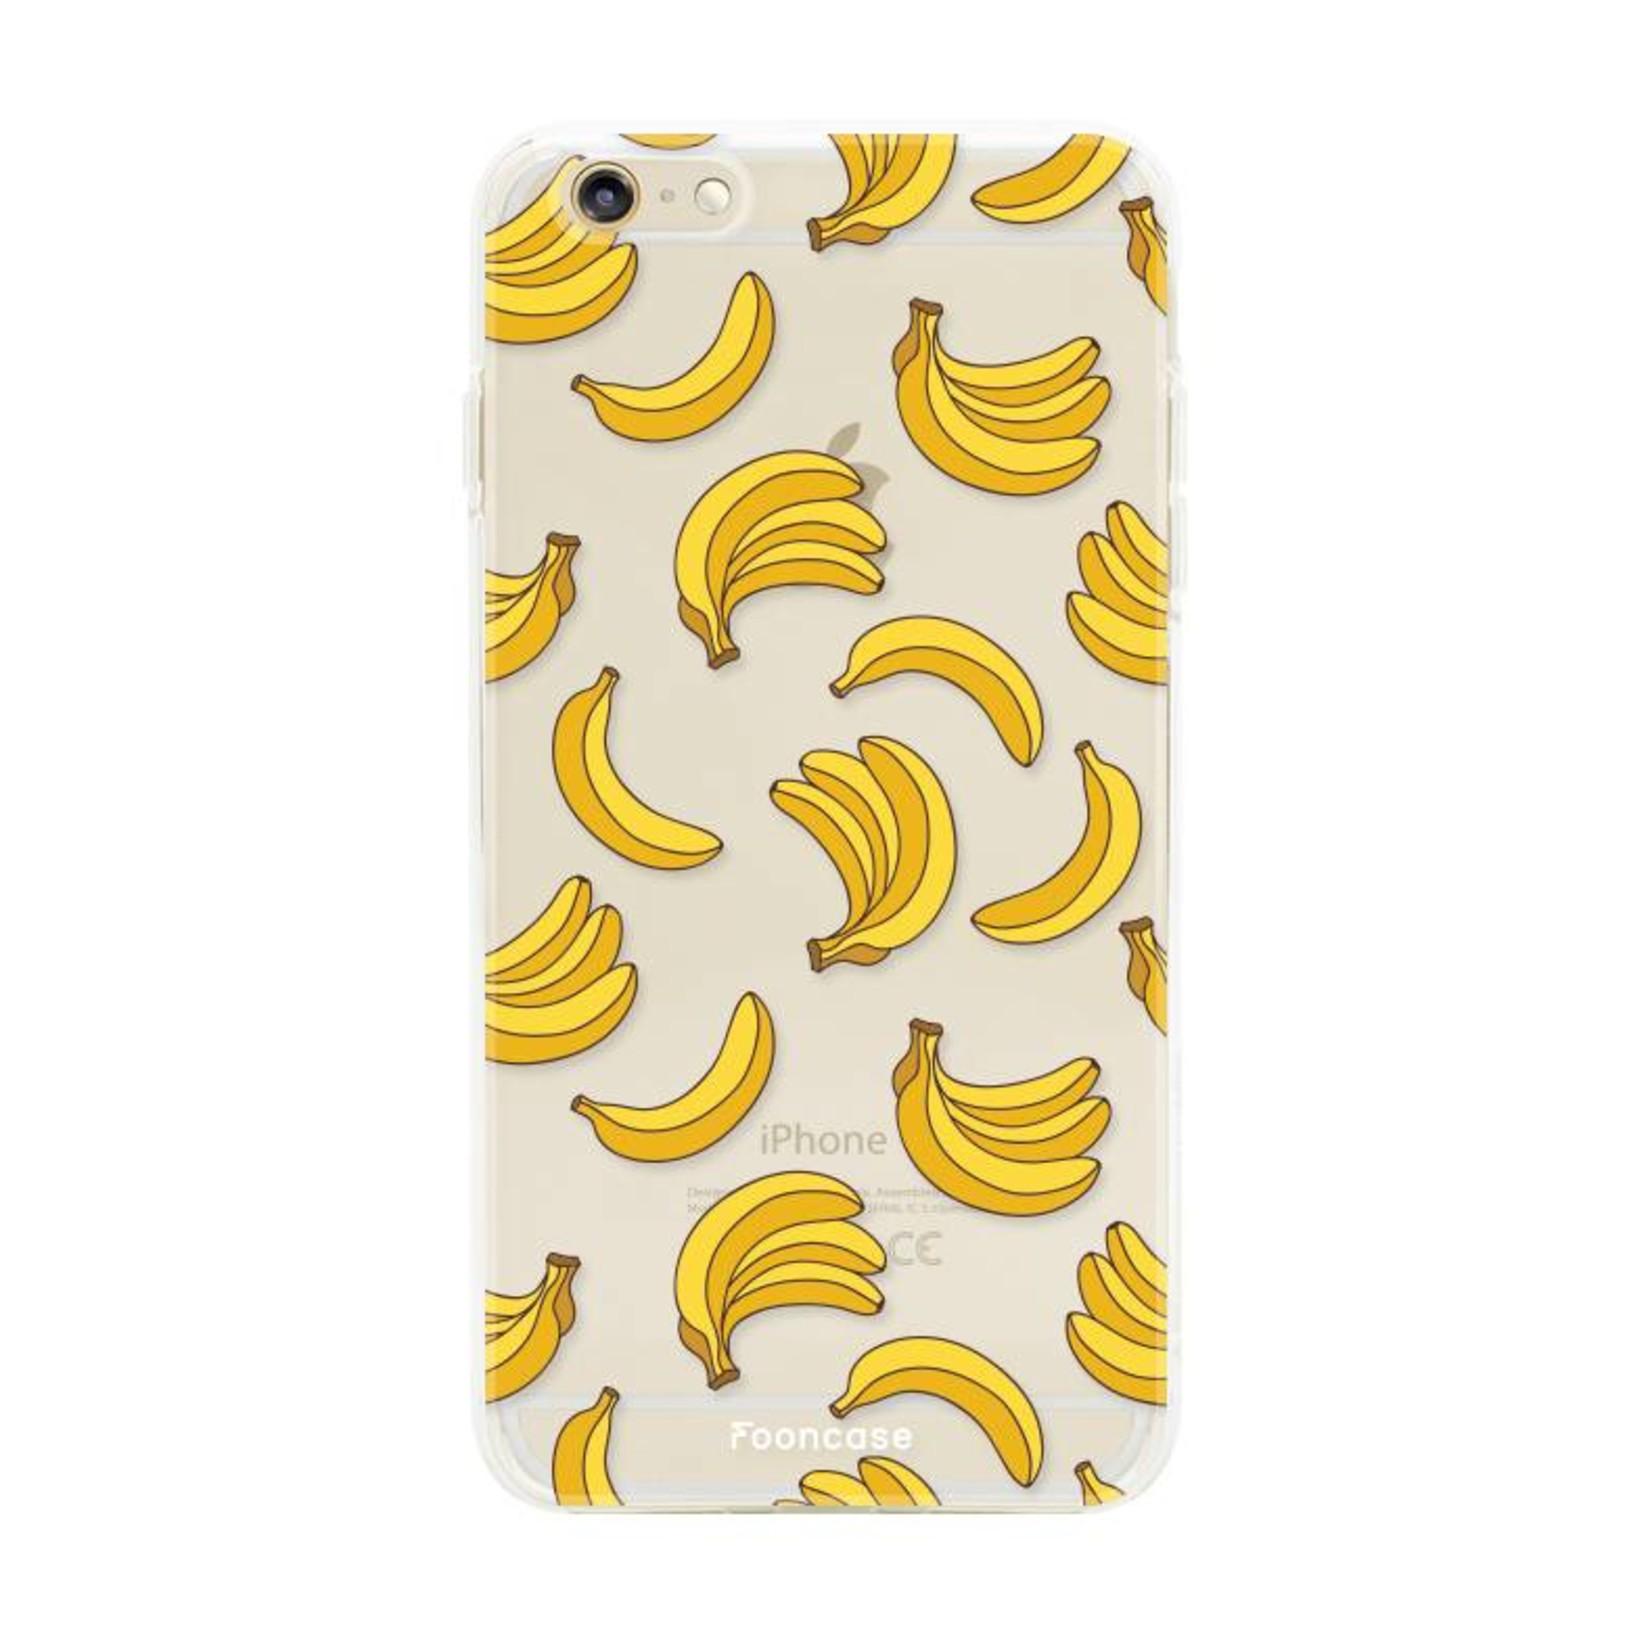 FOONCASE iPhone 6 Plus hoesje TPU Soft Case - Back Cover - Bananas / Banaan / Bananen